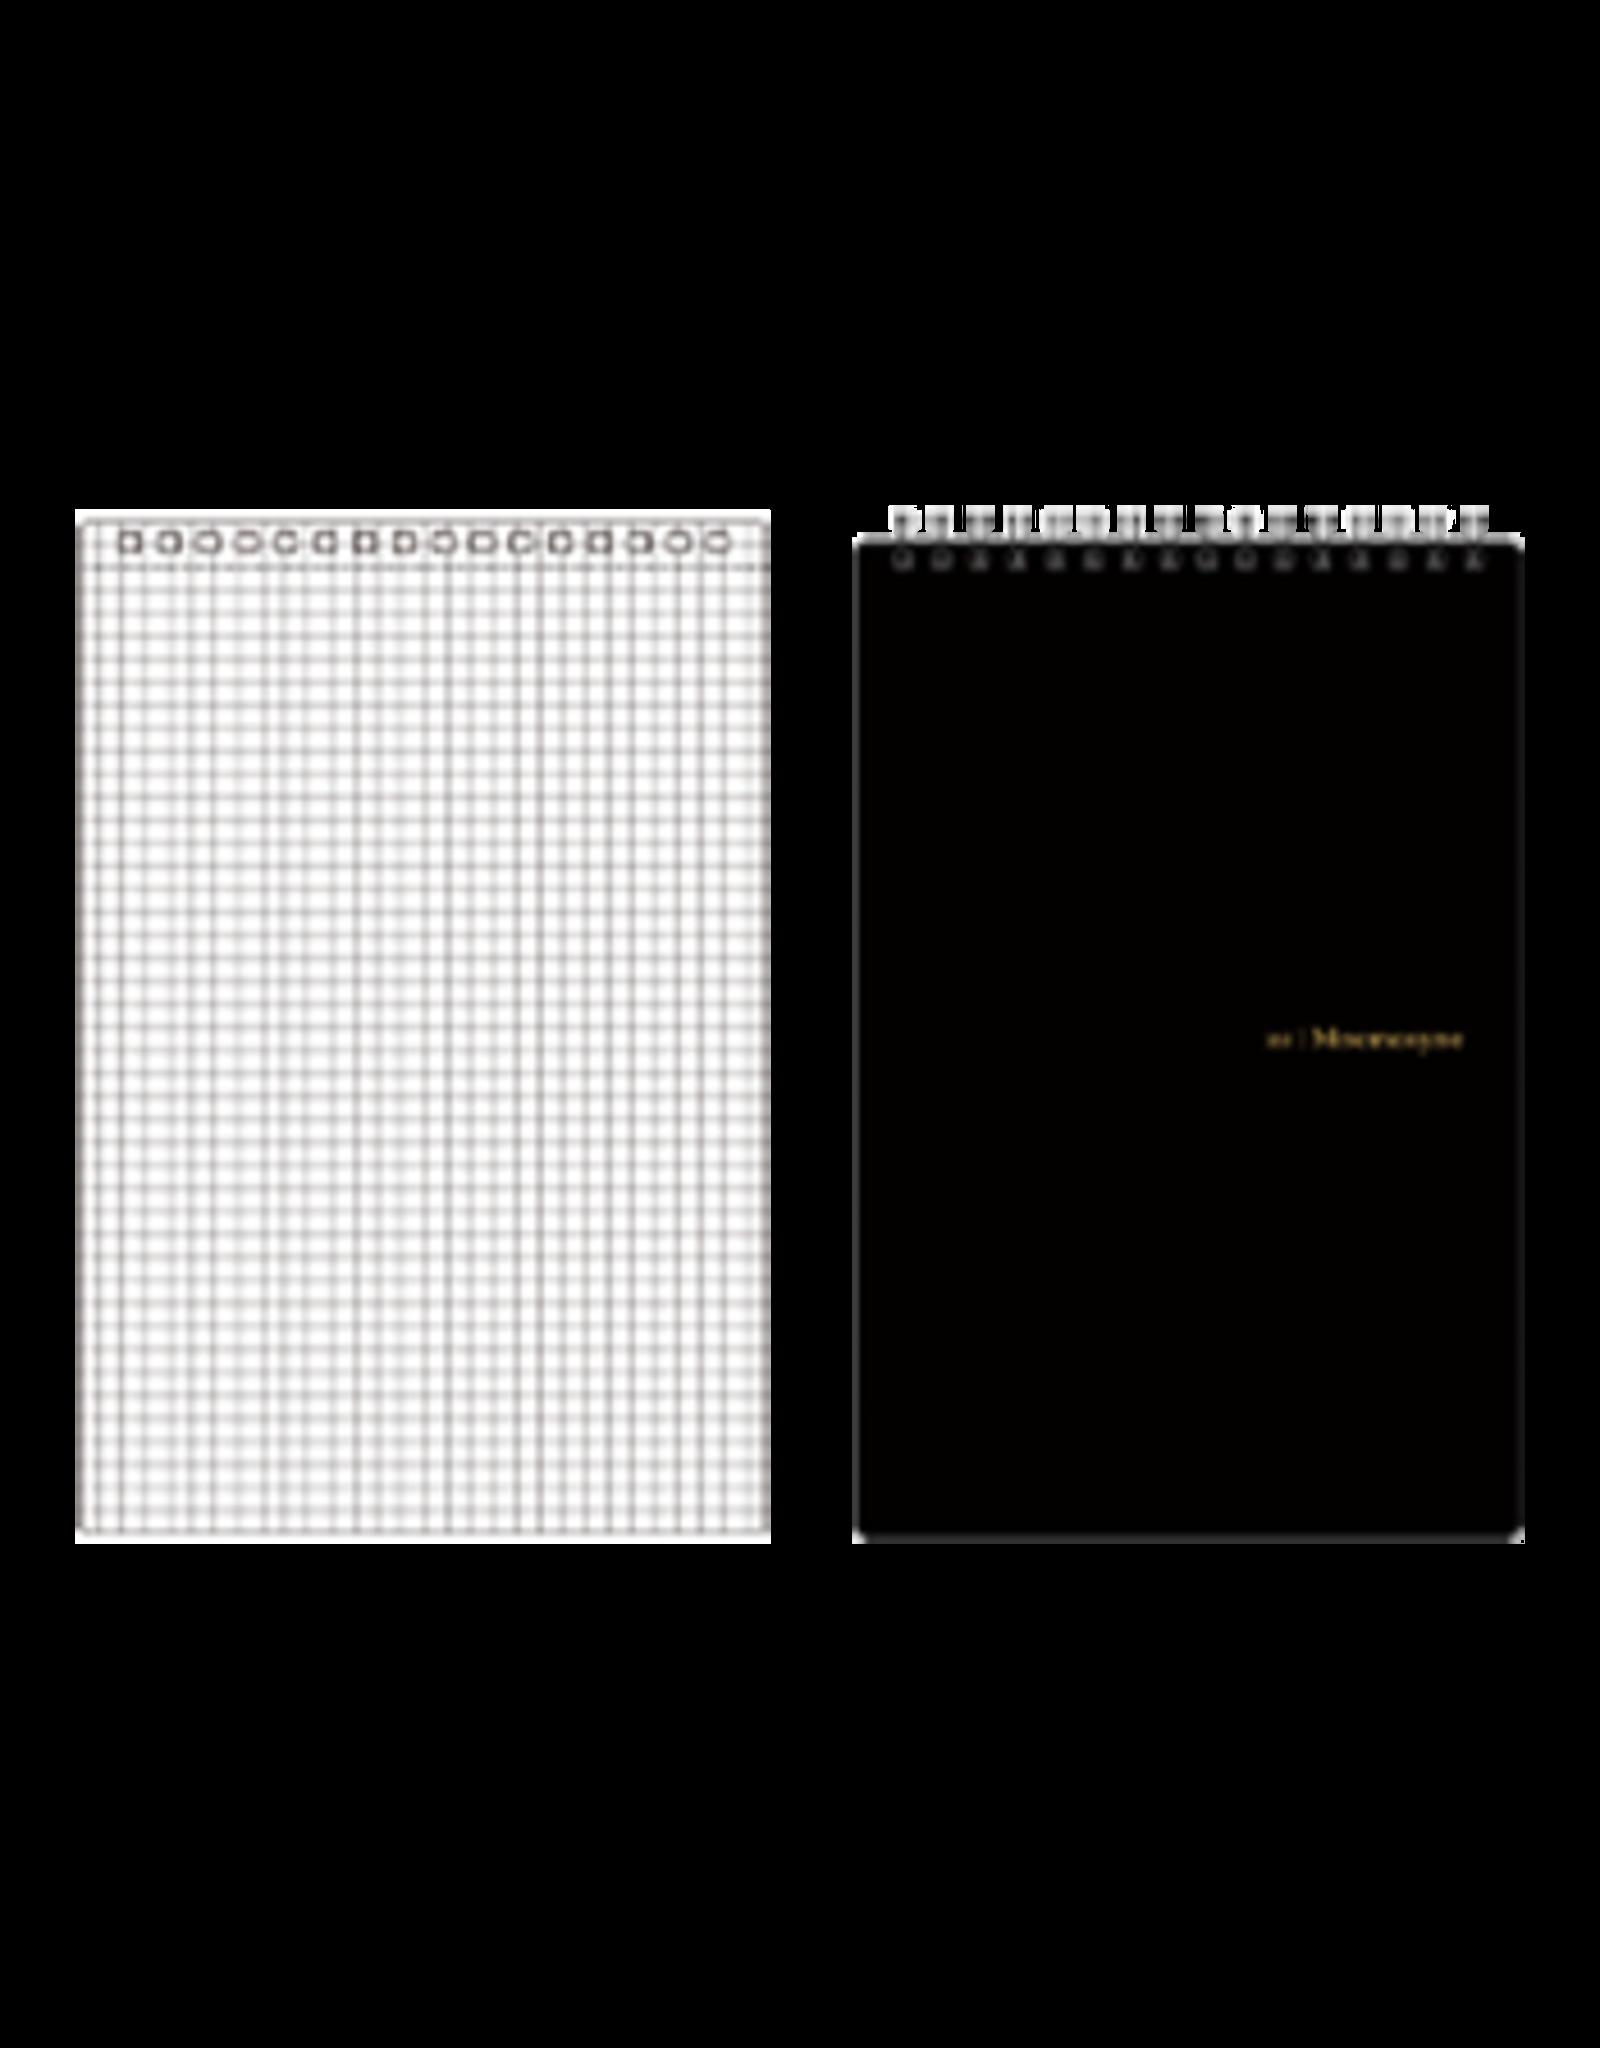 MARUMAN N165 MNEMOSYNE NOTEBOOK 5MM SQUARED A5 230X148MM